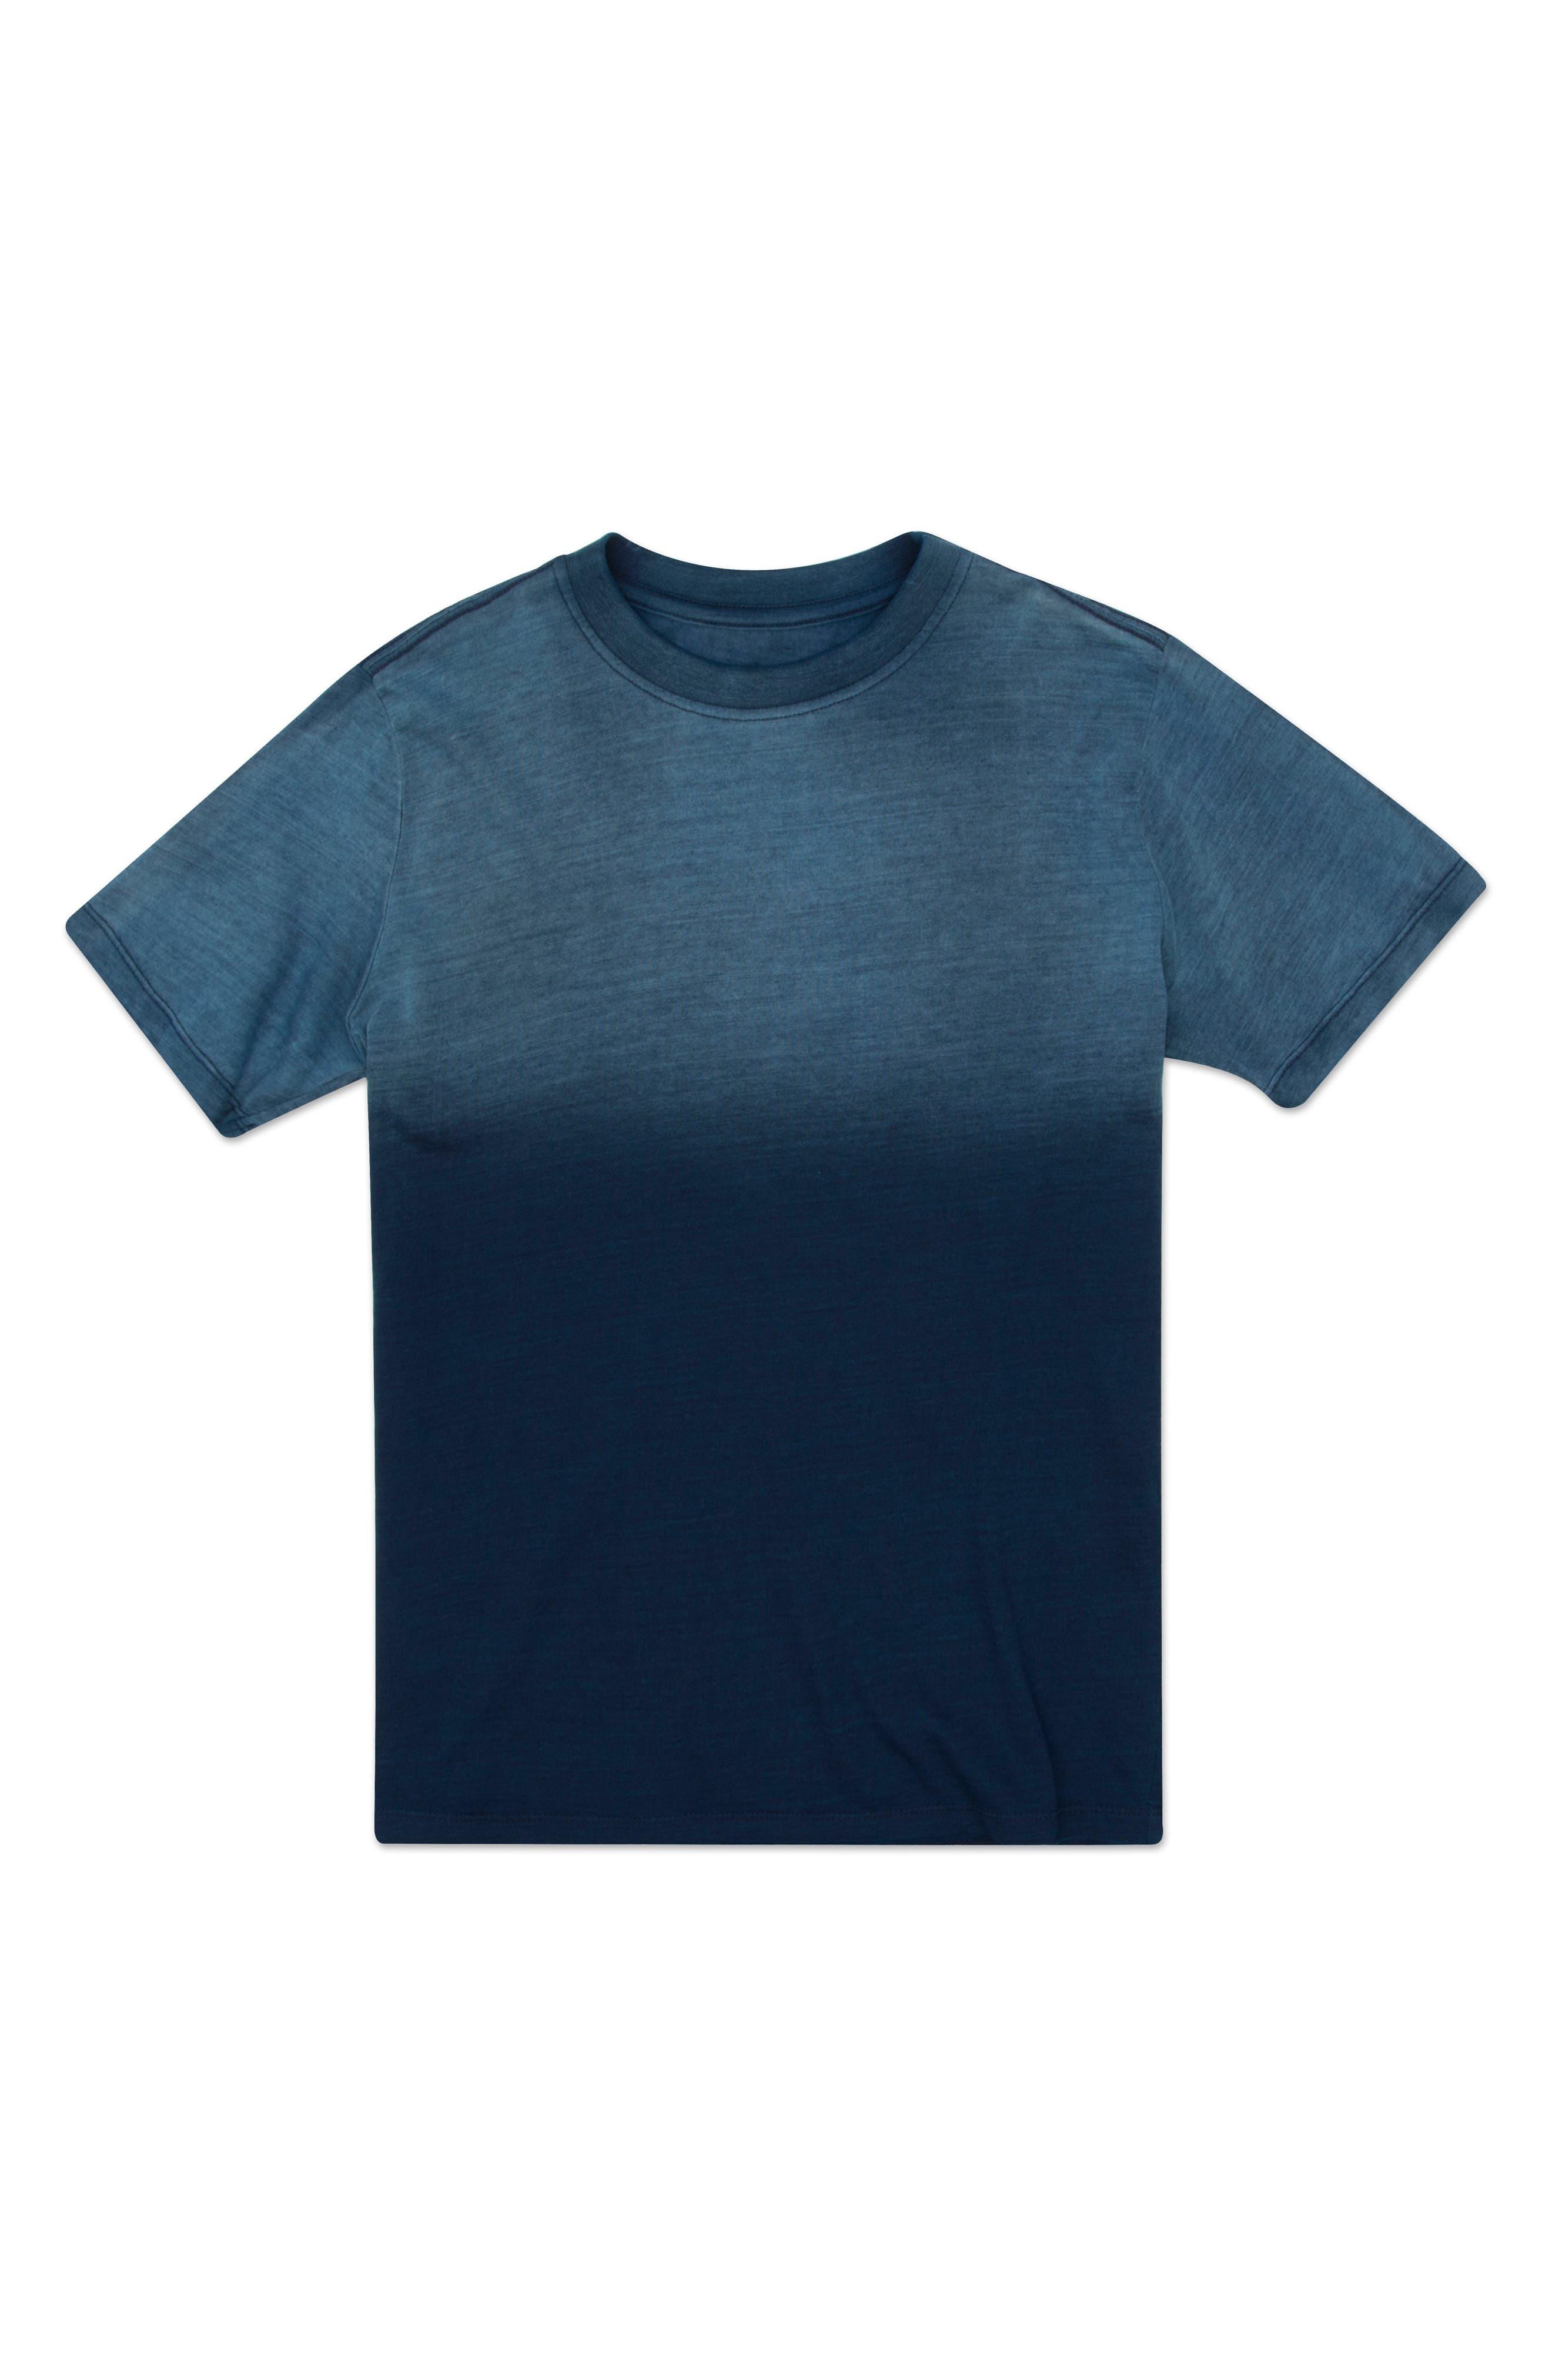 Alternate Image 1 Selected - ag adriano goldschmied kids Dante Crewneck T-Shirt (Toddler Boys & Little Boys)